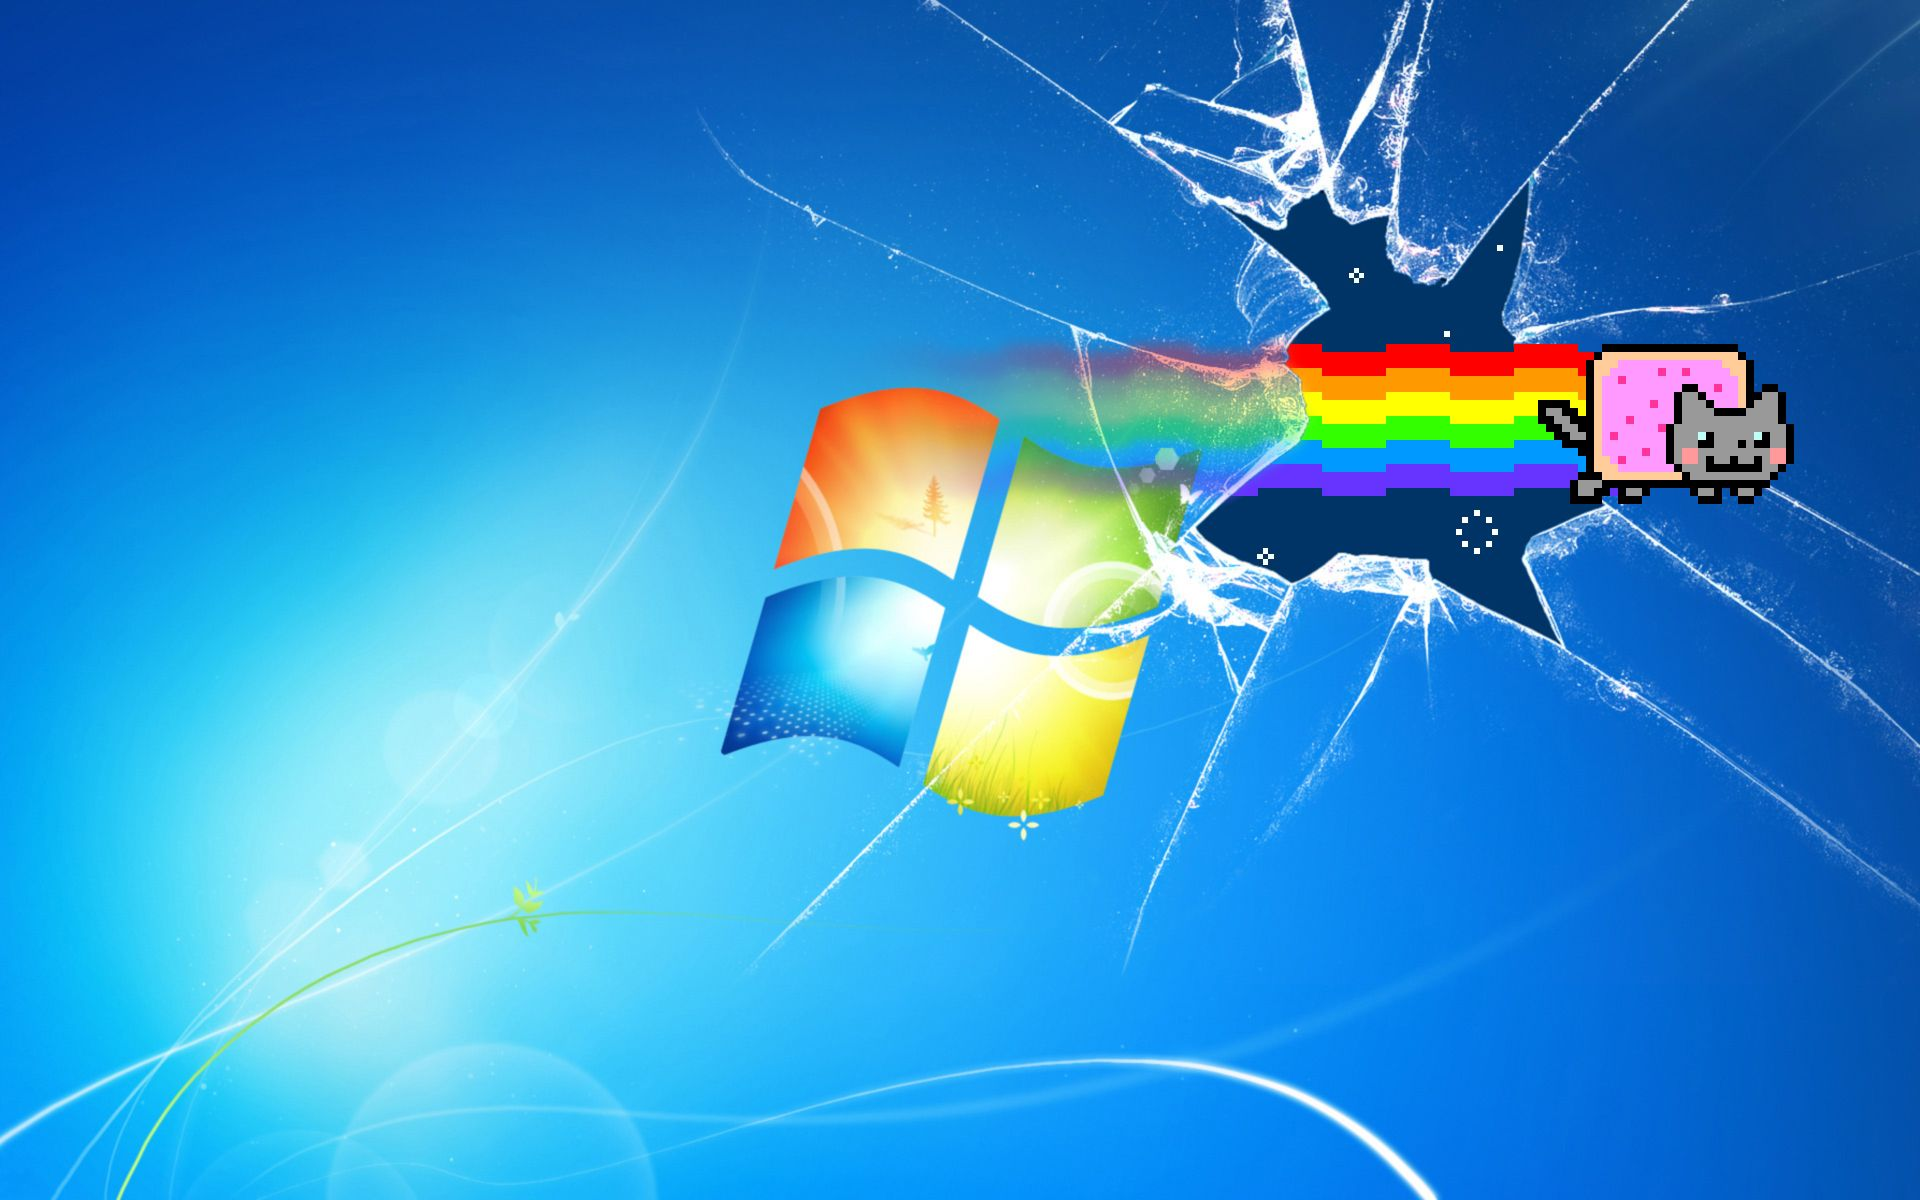 Nyan Cat Desktop Background | HD Nyan Cat Wallpaper ...